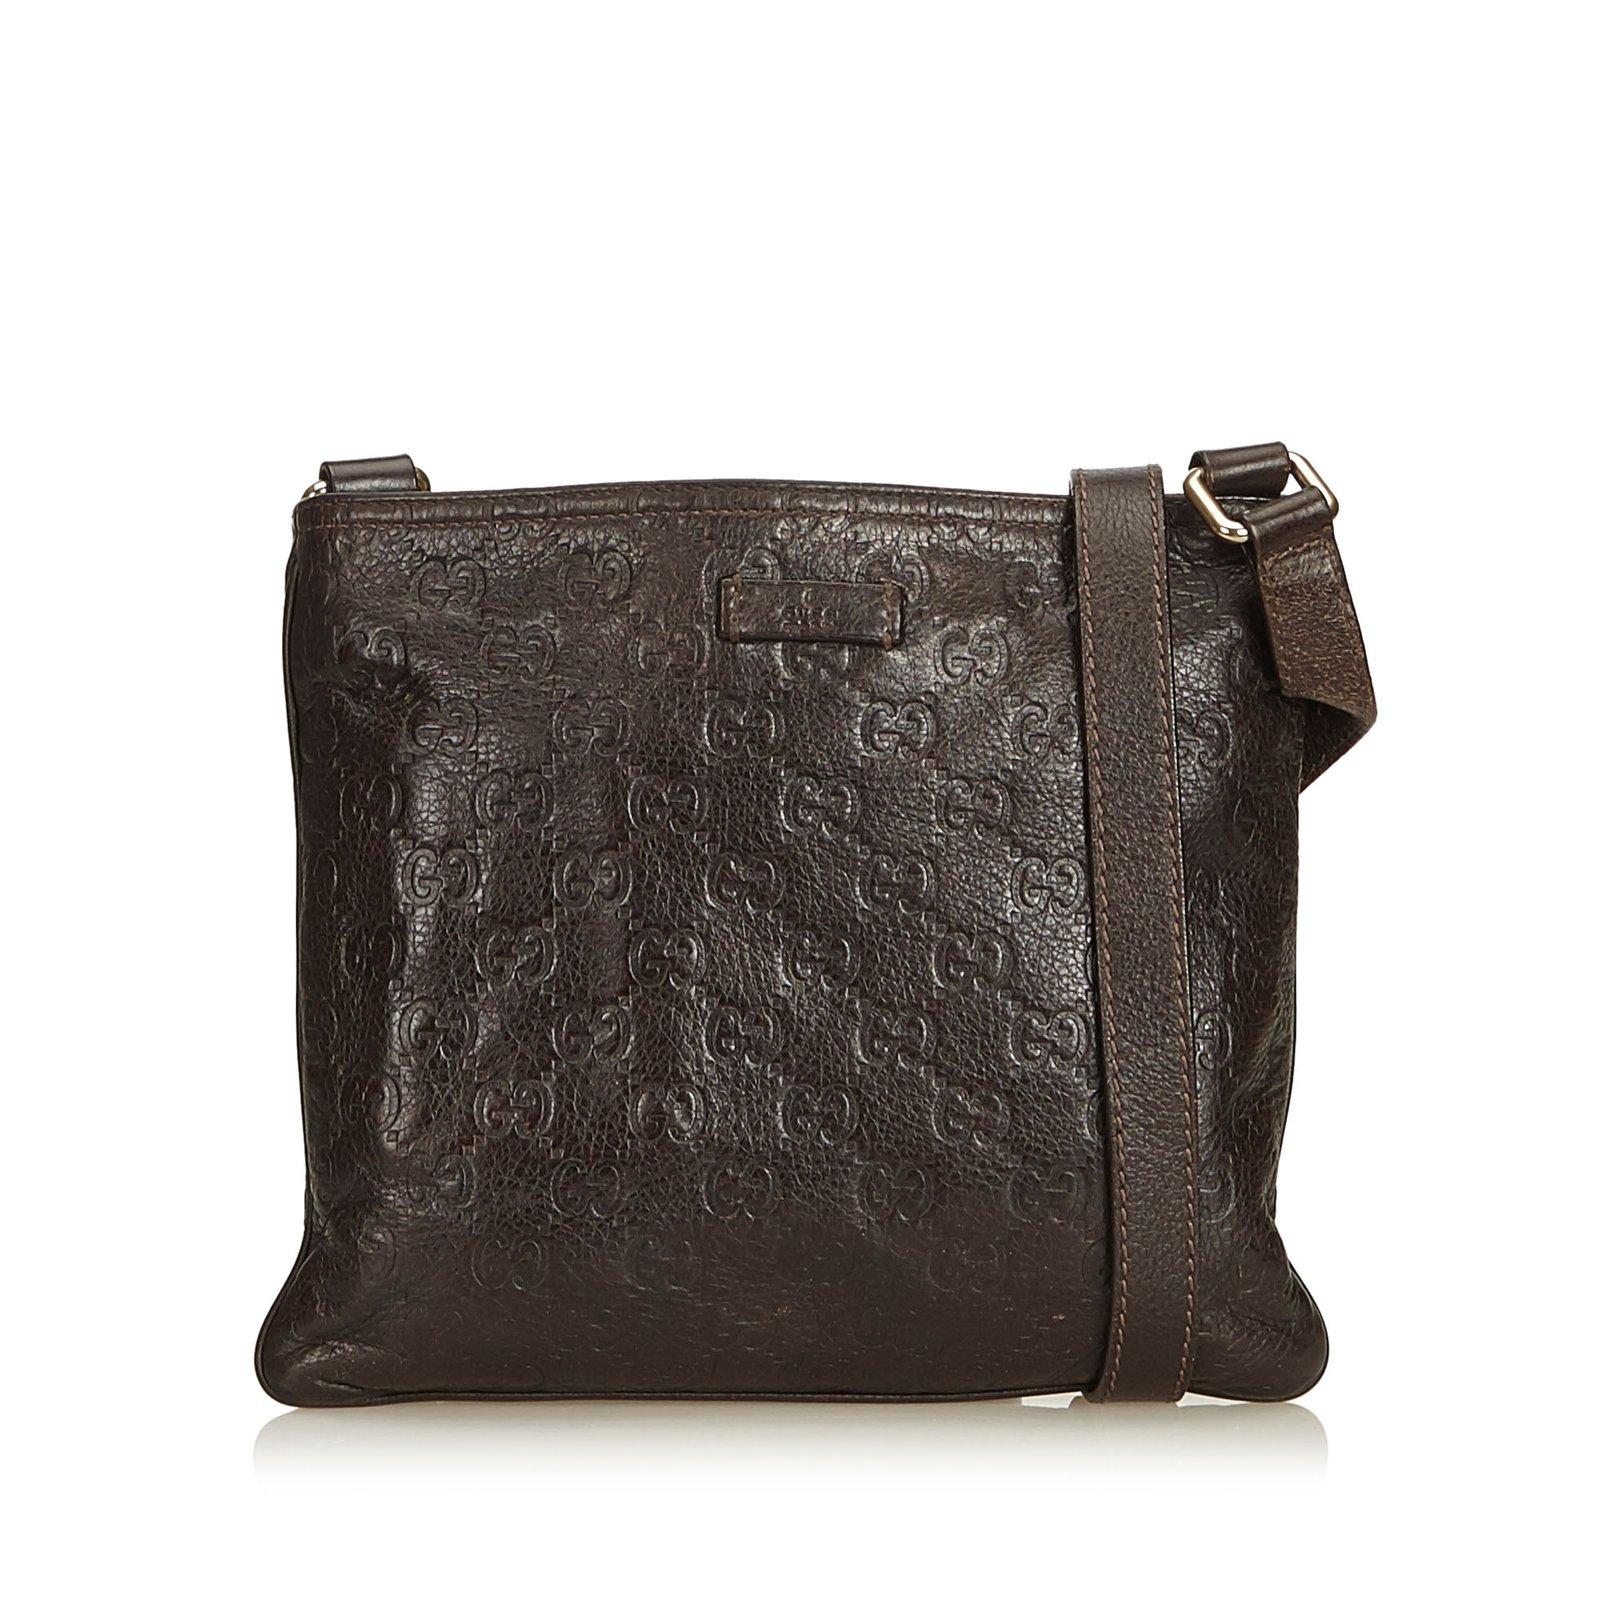 4fc8119bd76505 Gucci Guccissima Crossbody Bag Handbags Leather,Other Brown,Dark brown  ref.90225